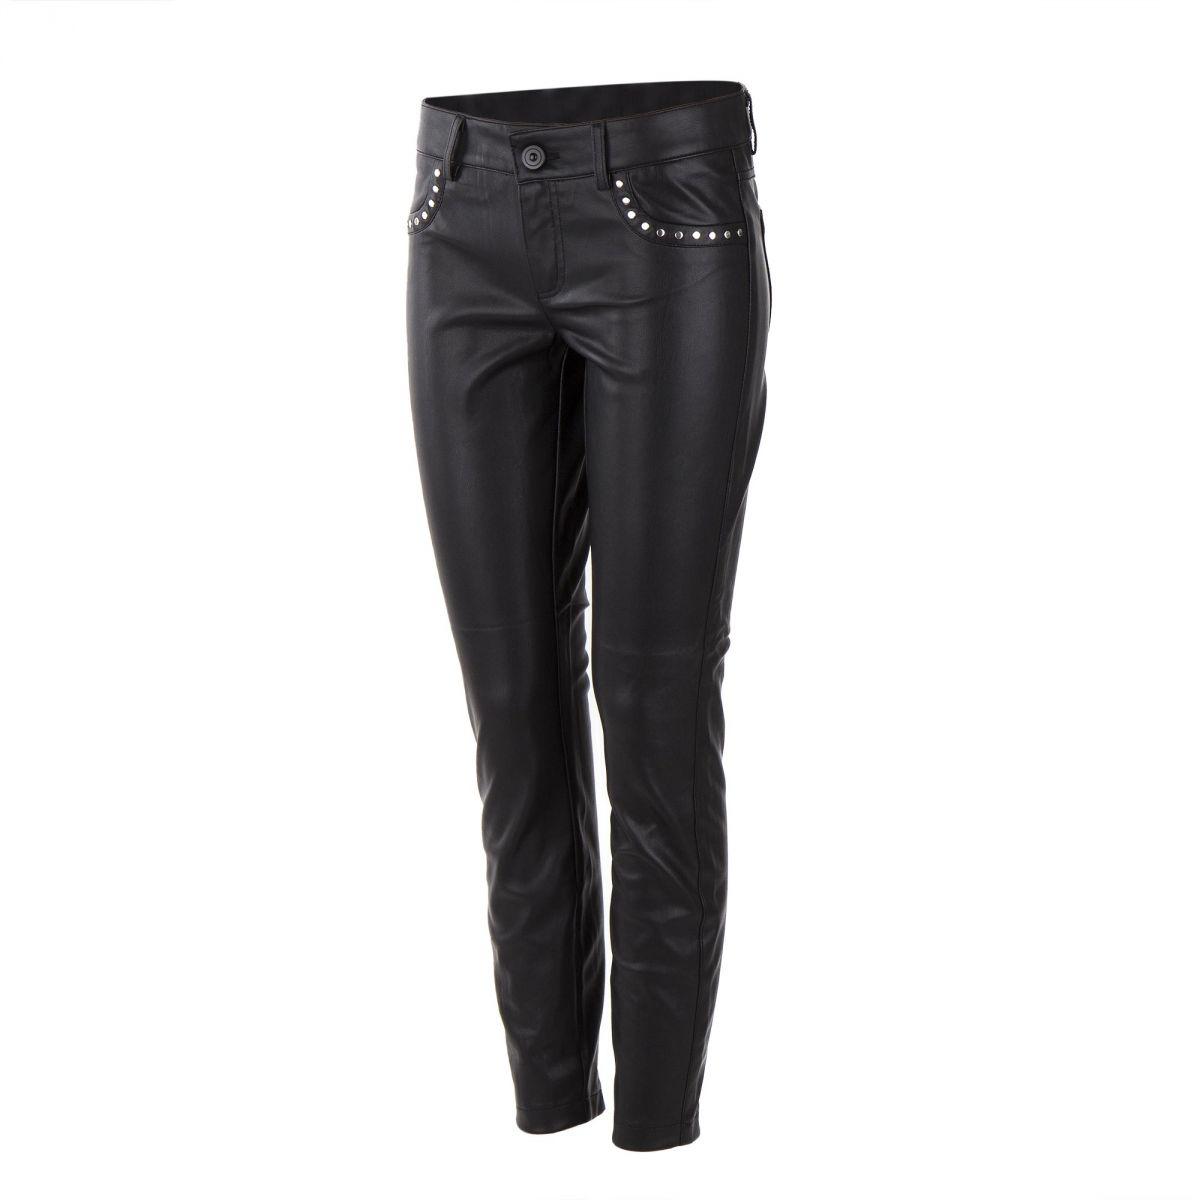 pantalon slim simili cuir noir femme on you prix d griff. Black Bedroom Furniture Sets. Home Design Ideas